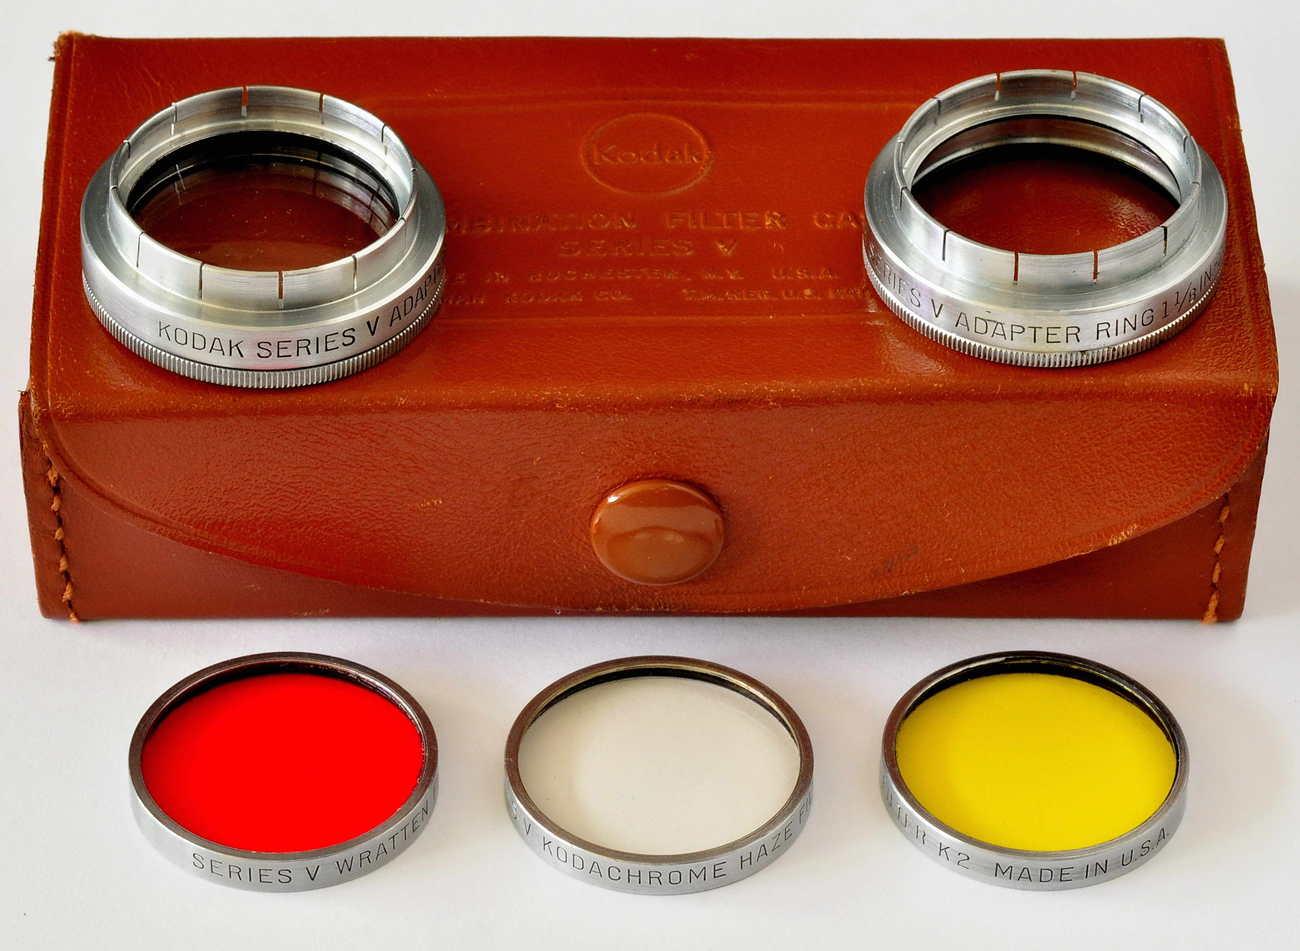 Kodak series v adapter set w 4 filters. small file